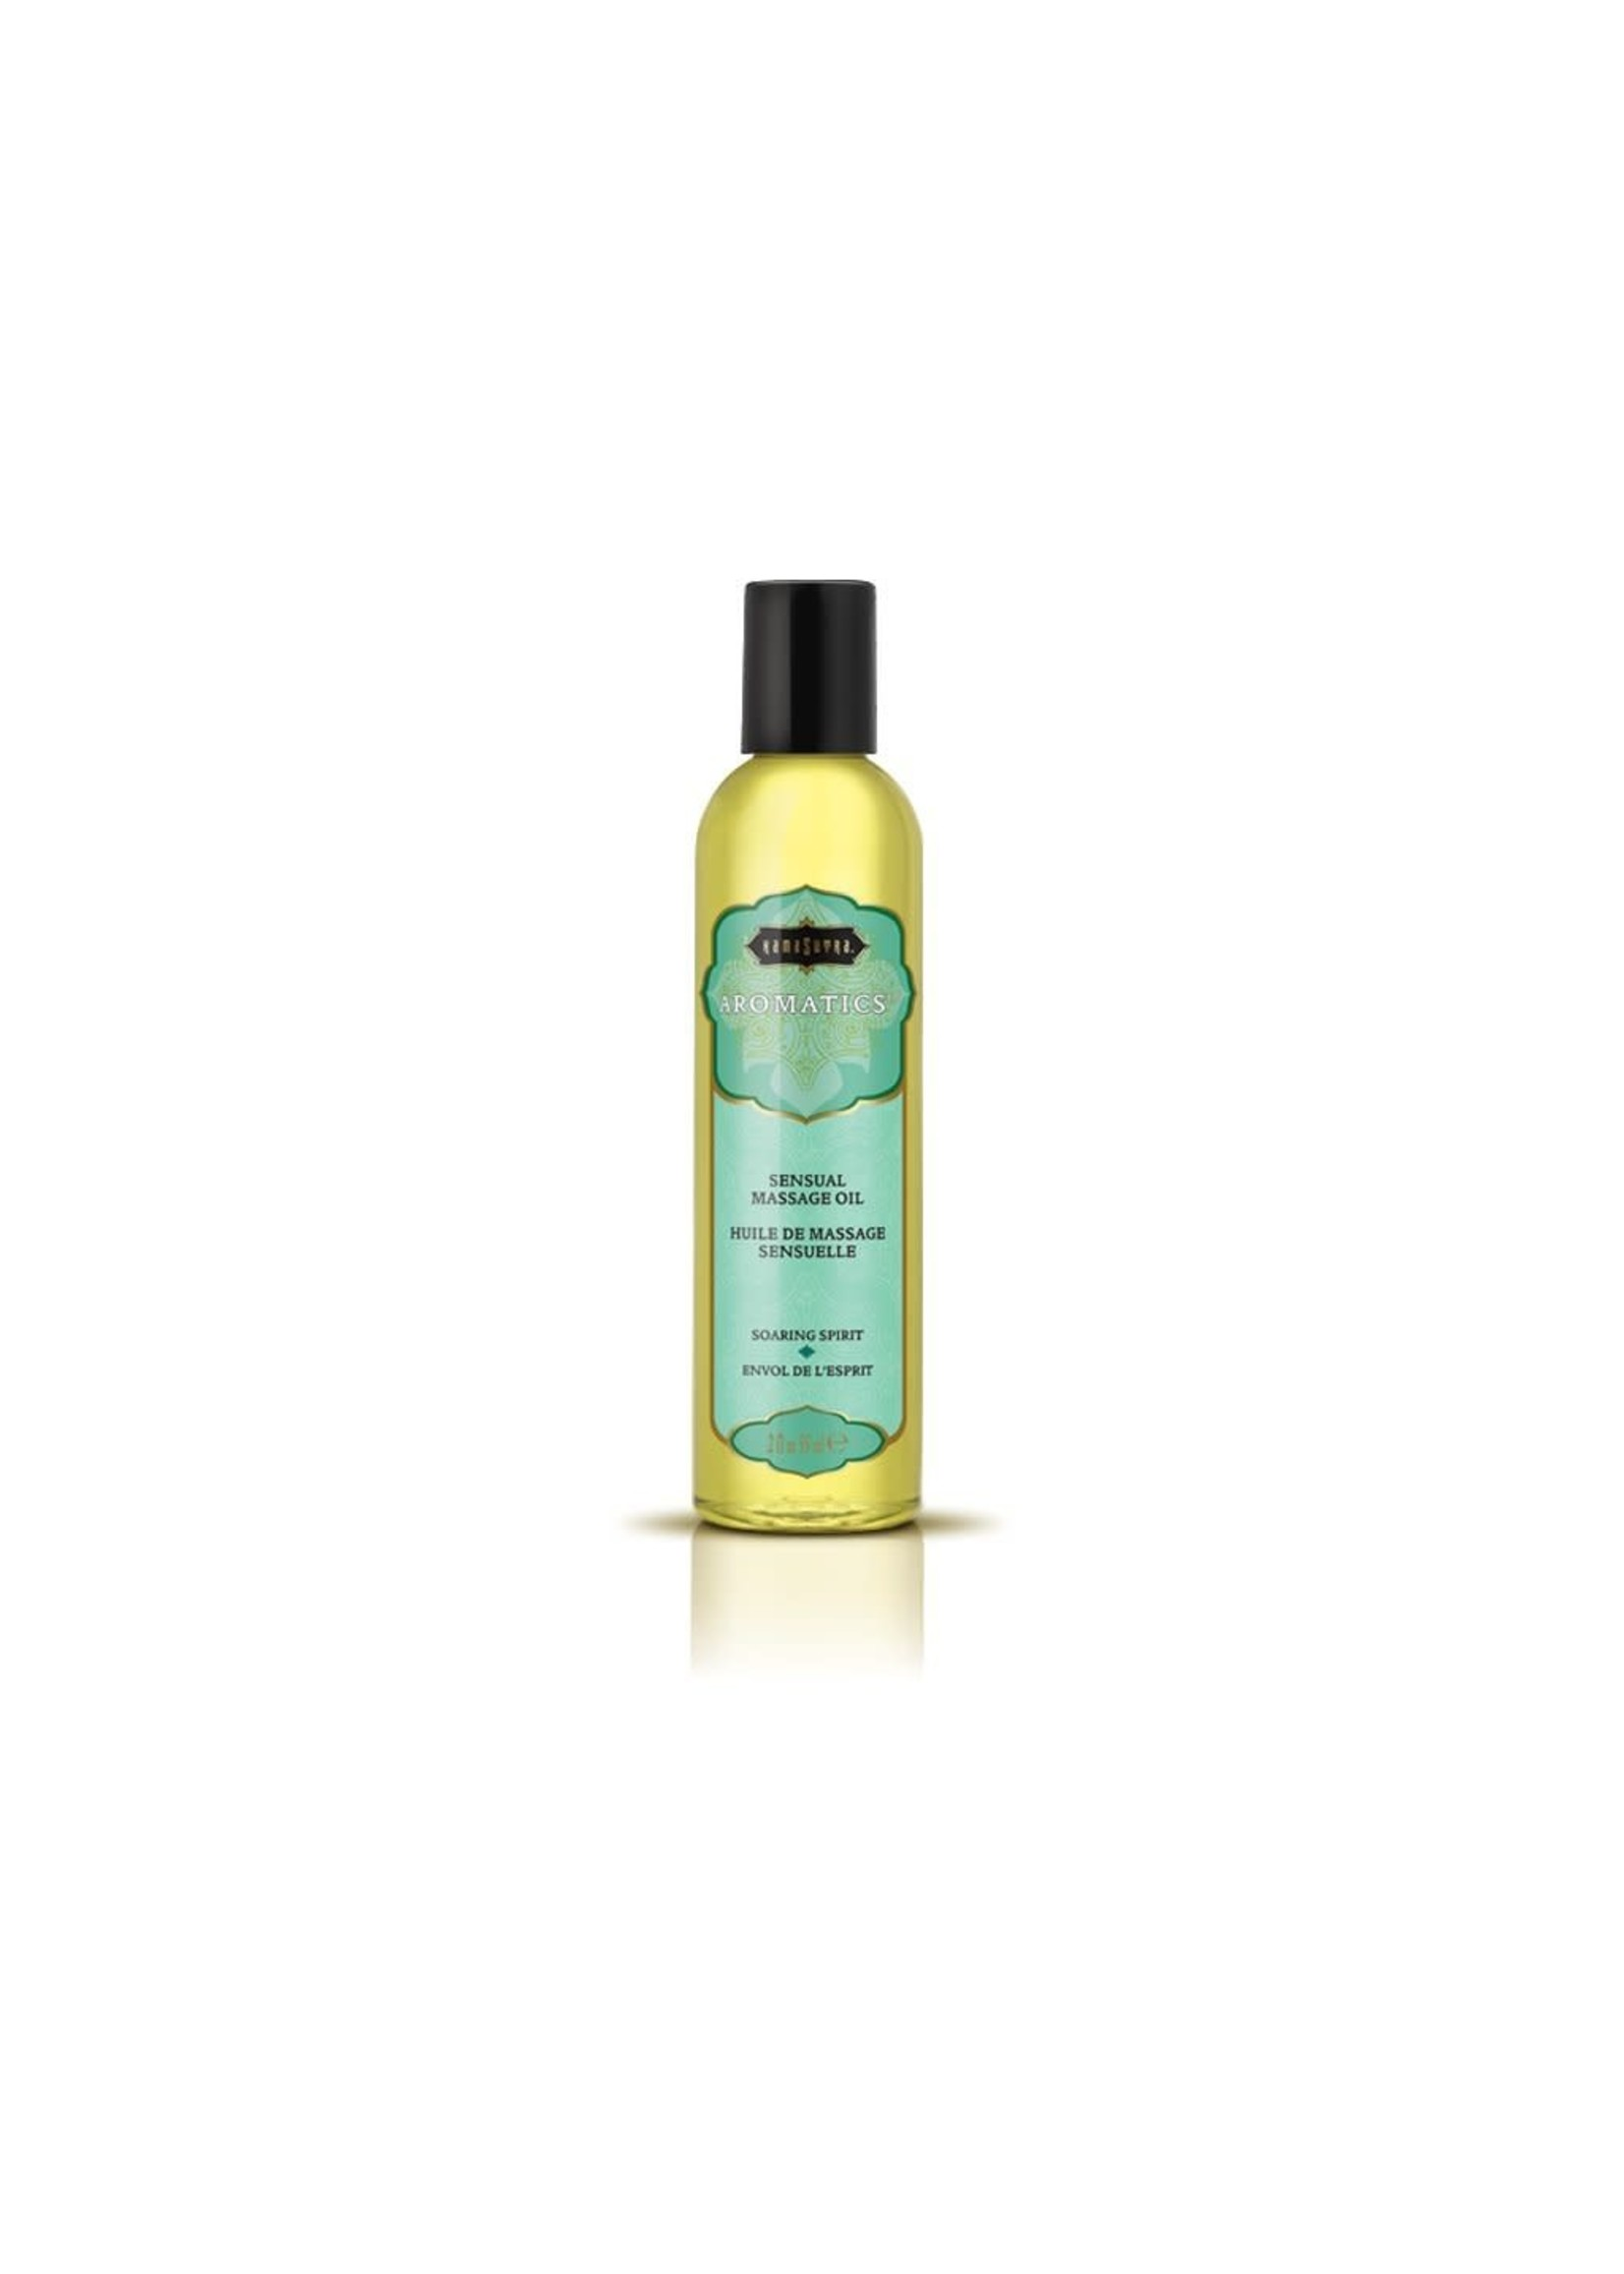 Kama Sutra Aromatics Massage Oil Soaring Spirit 2fl oz